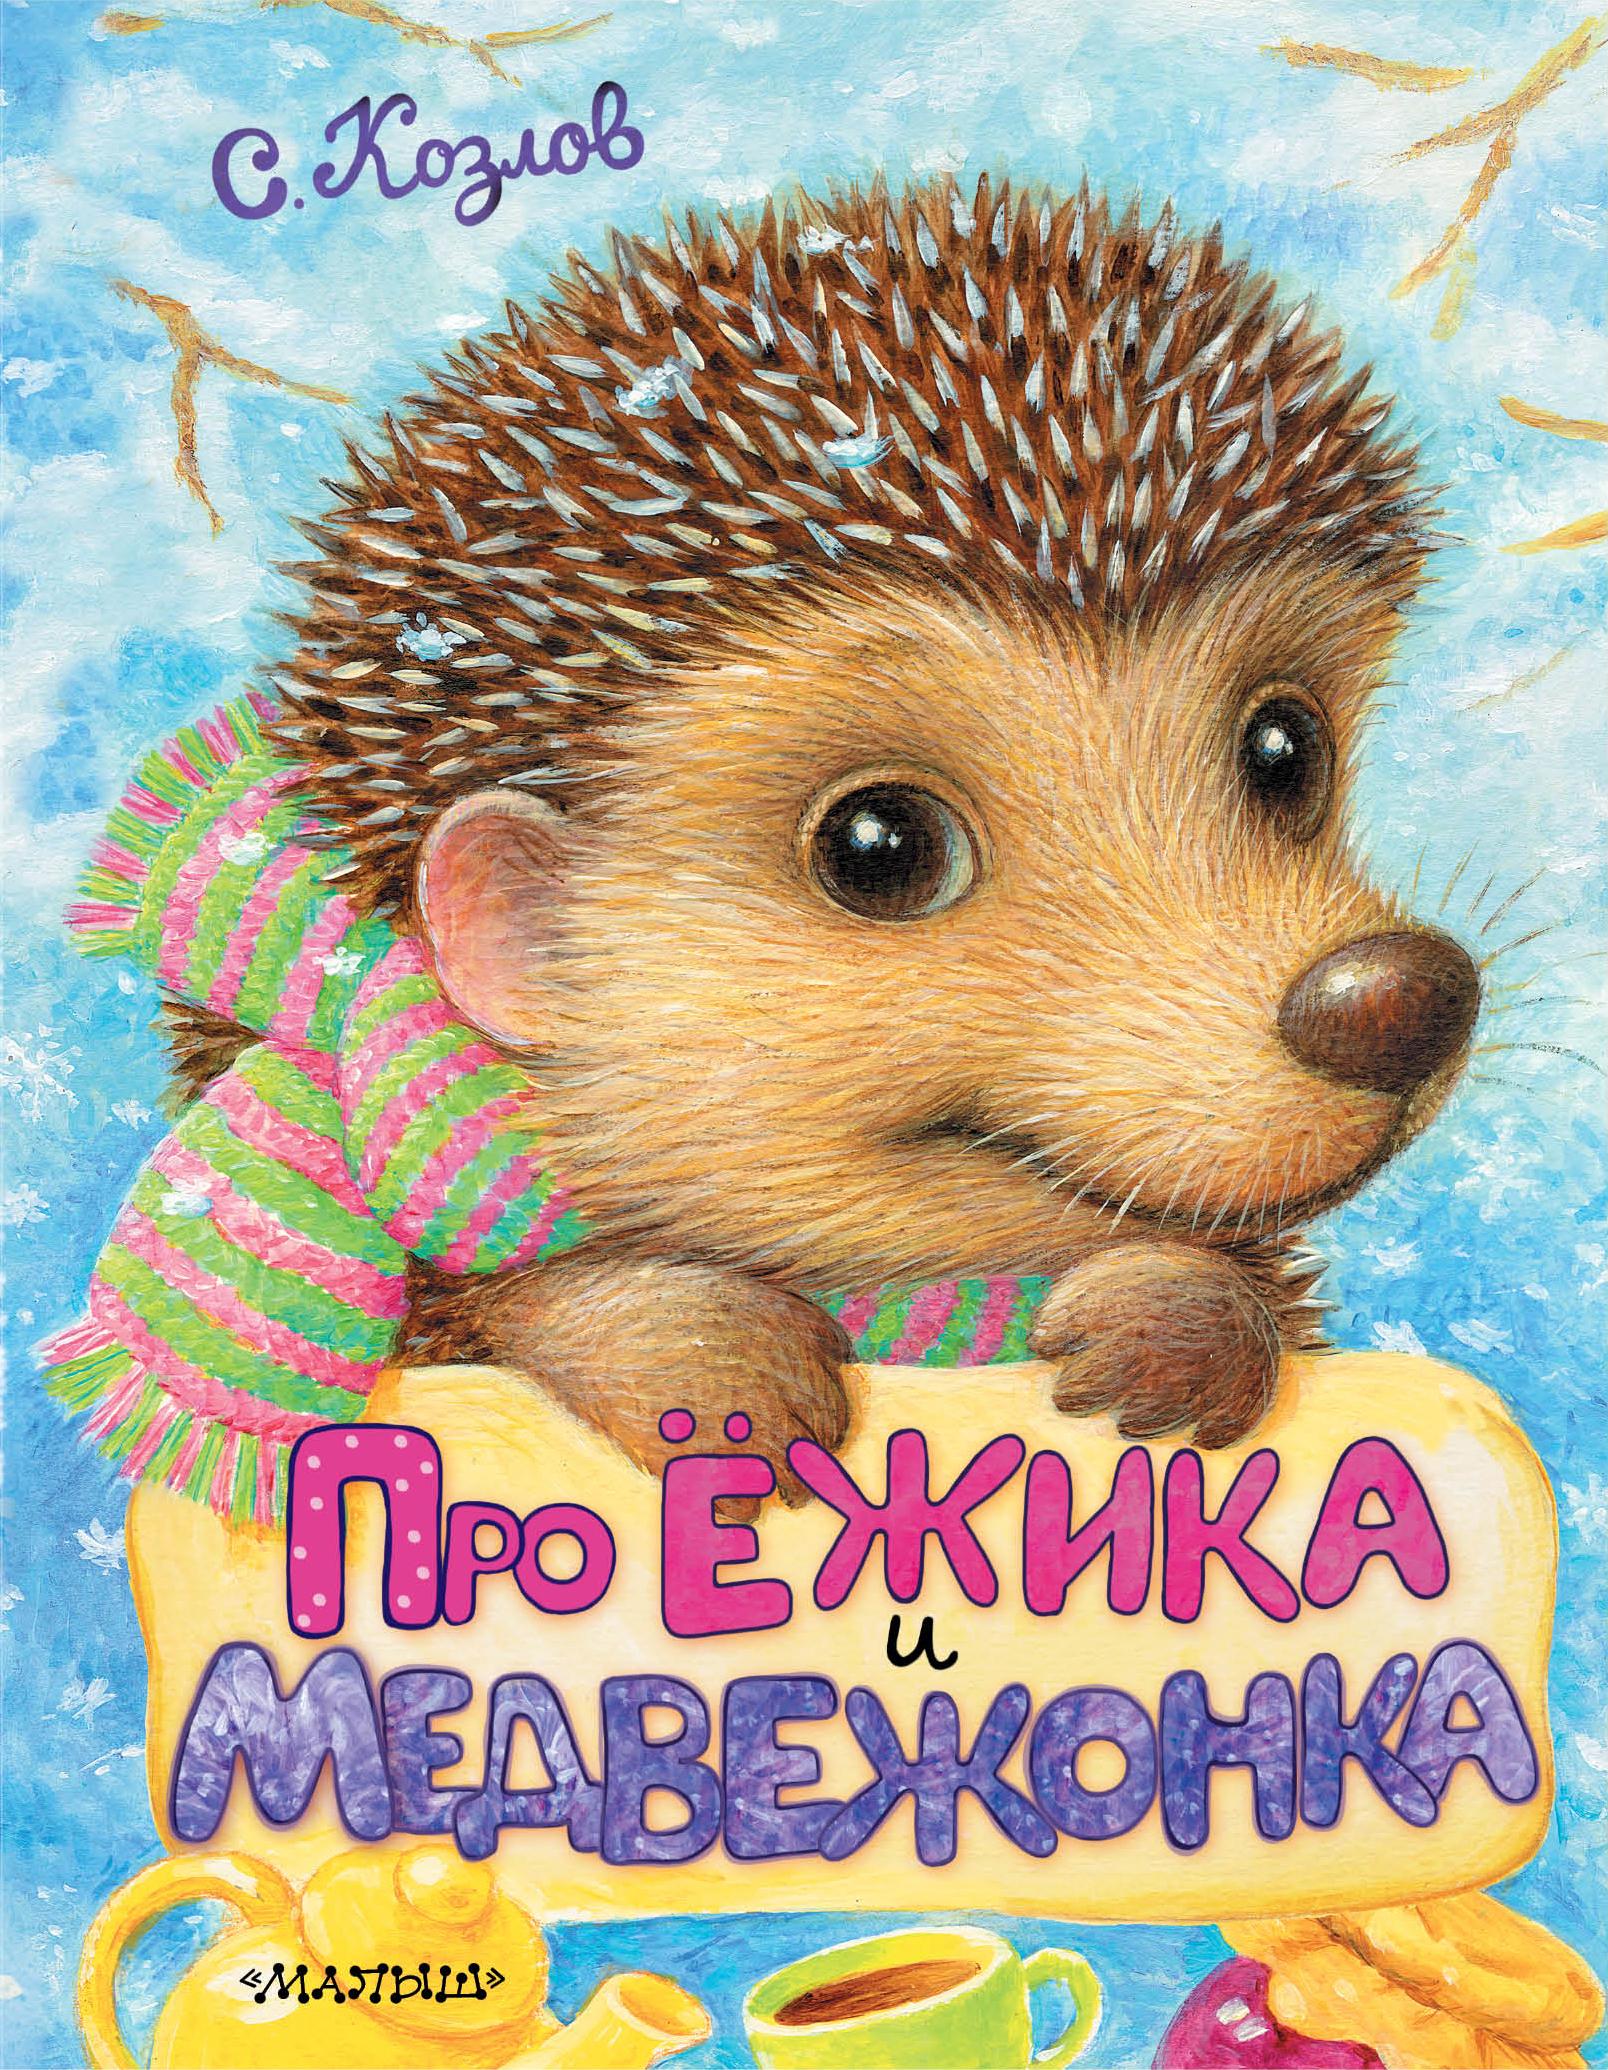 С. Козлов Про Ёжика и Медвежонка цена и фото